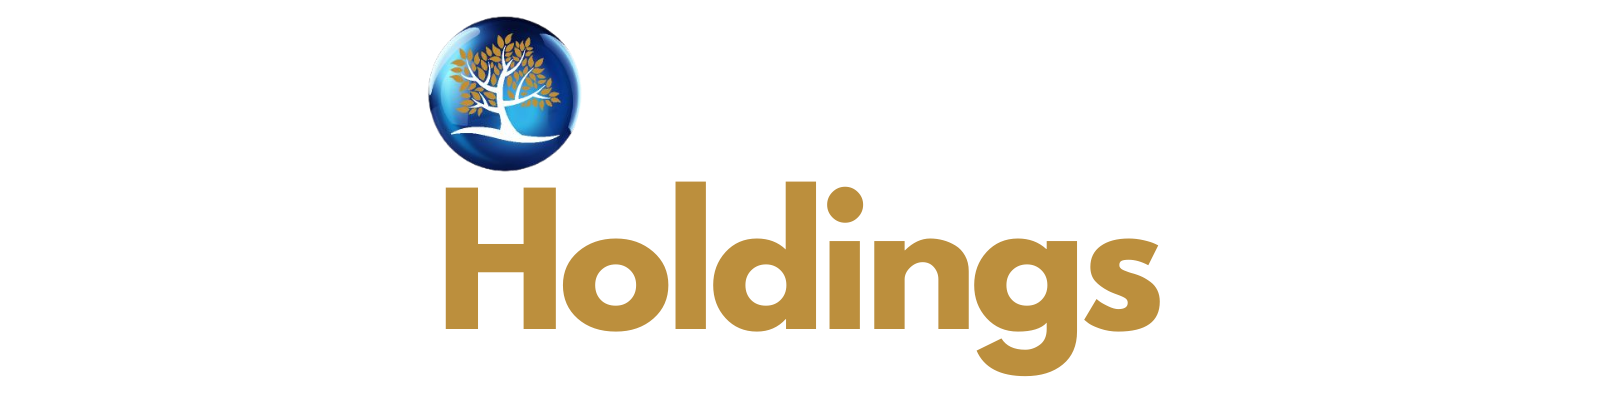 Covenant Holdings